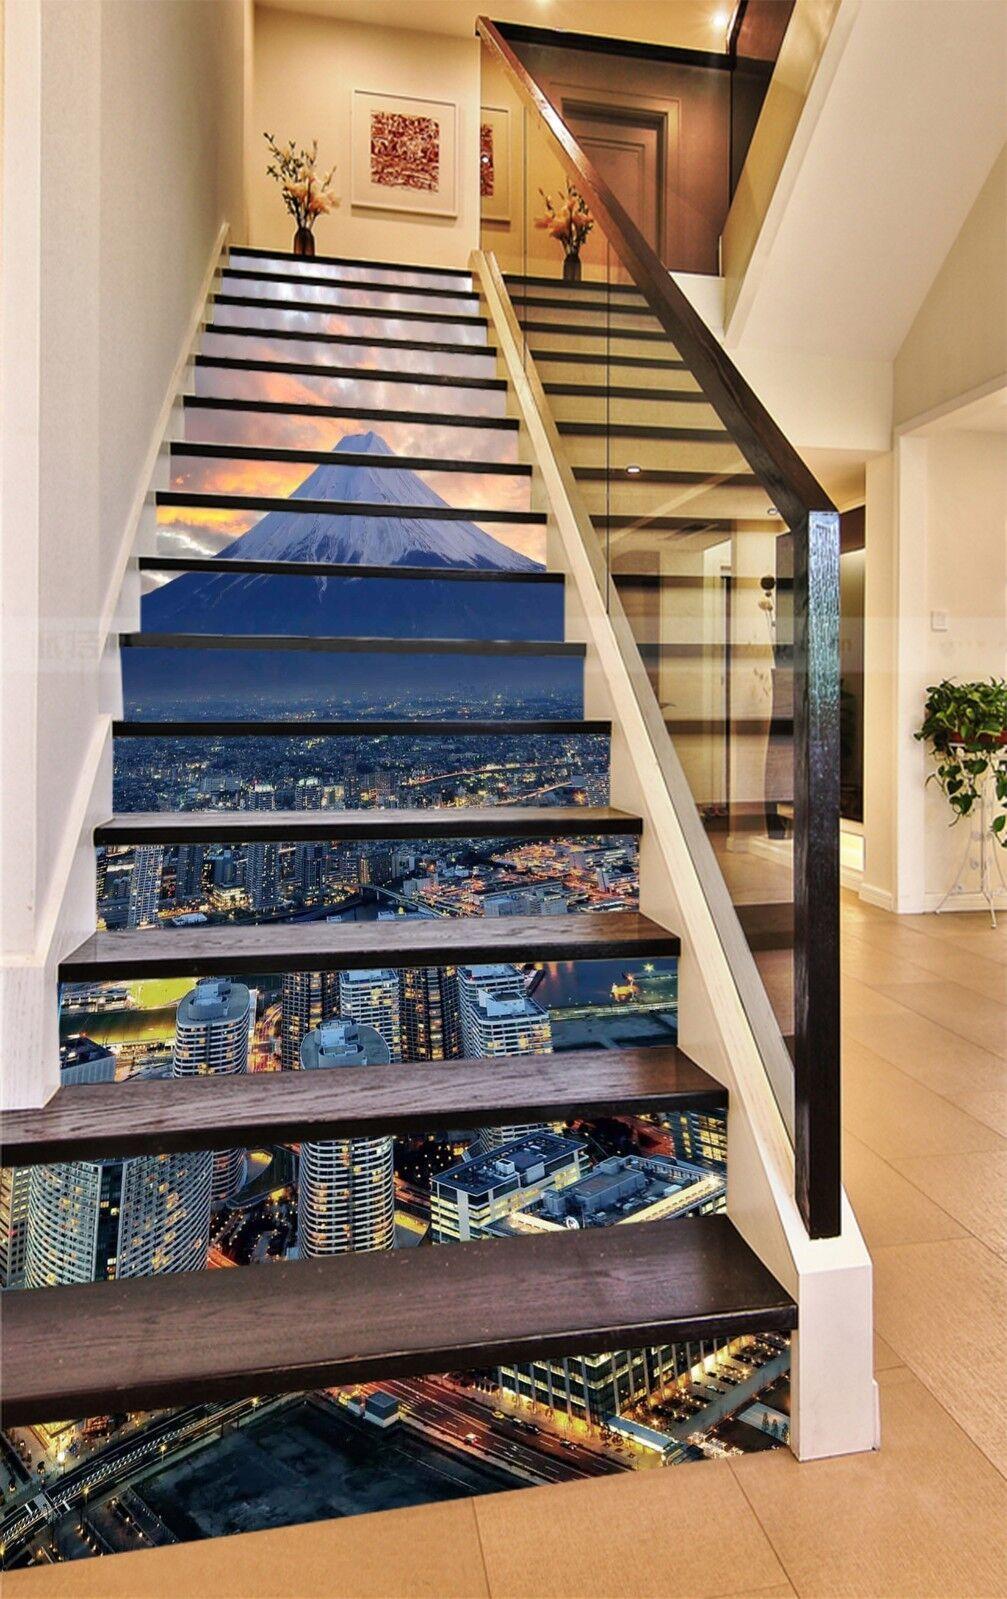 3D City mountain Stair Risers Decoration Photo Mural Vinyl Decal Wallpaper AU